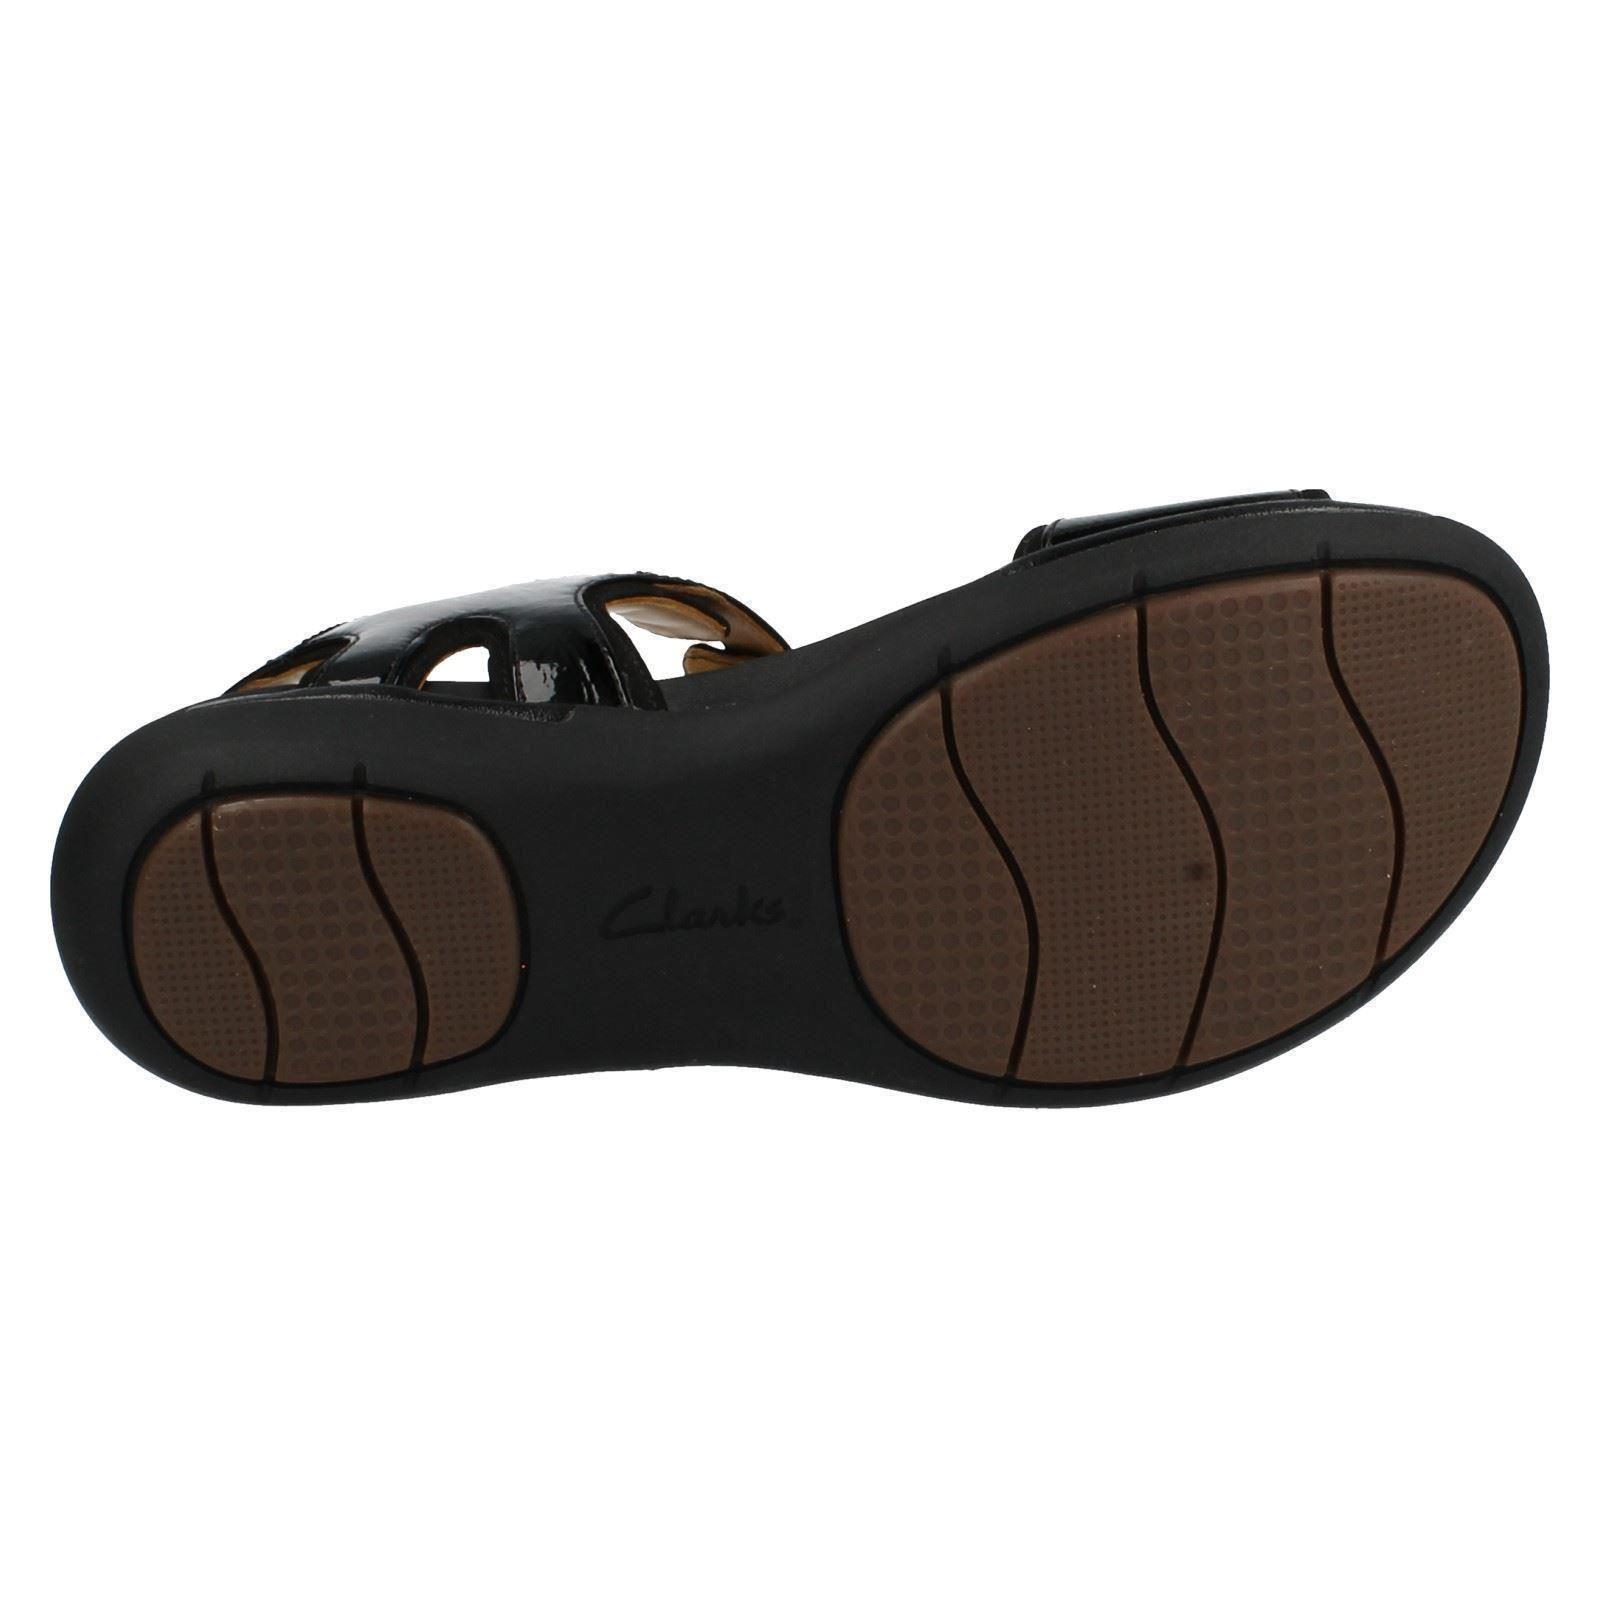 53d40620823 ... Ladies Clarks Unstructured Flat Summer Summer Summer Sandals The Style  - Un Voshell 7d73c3 ...